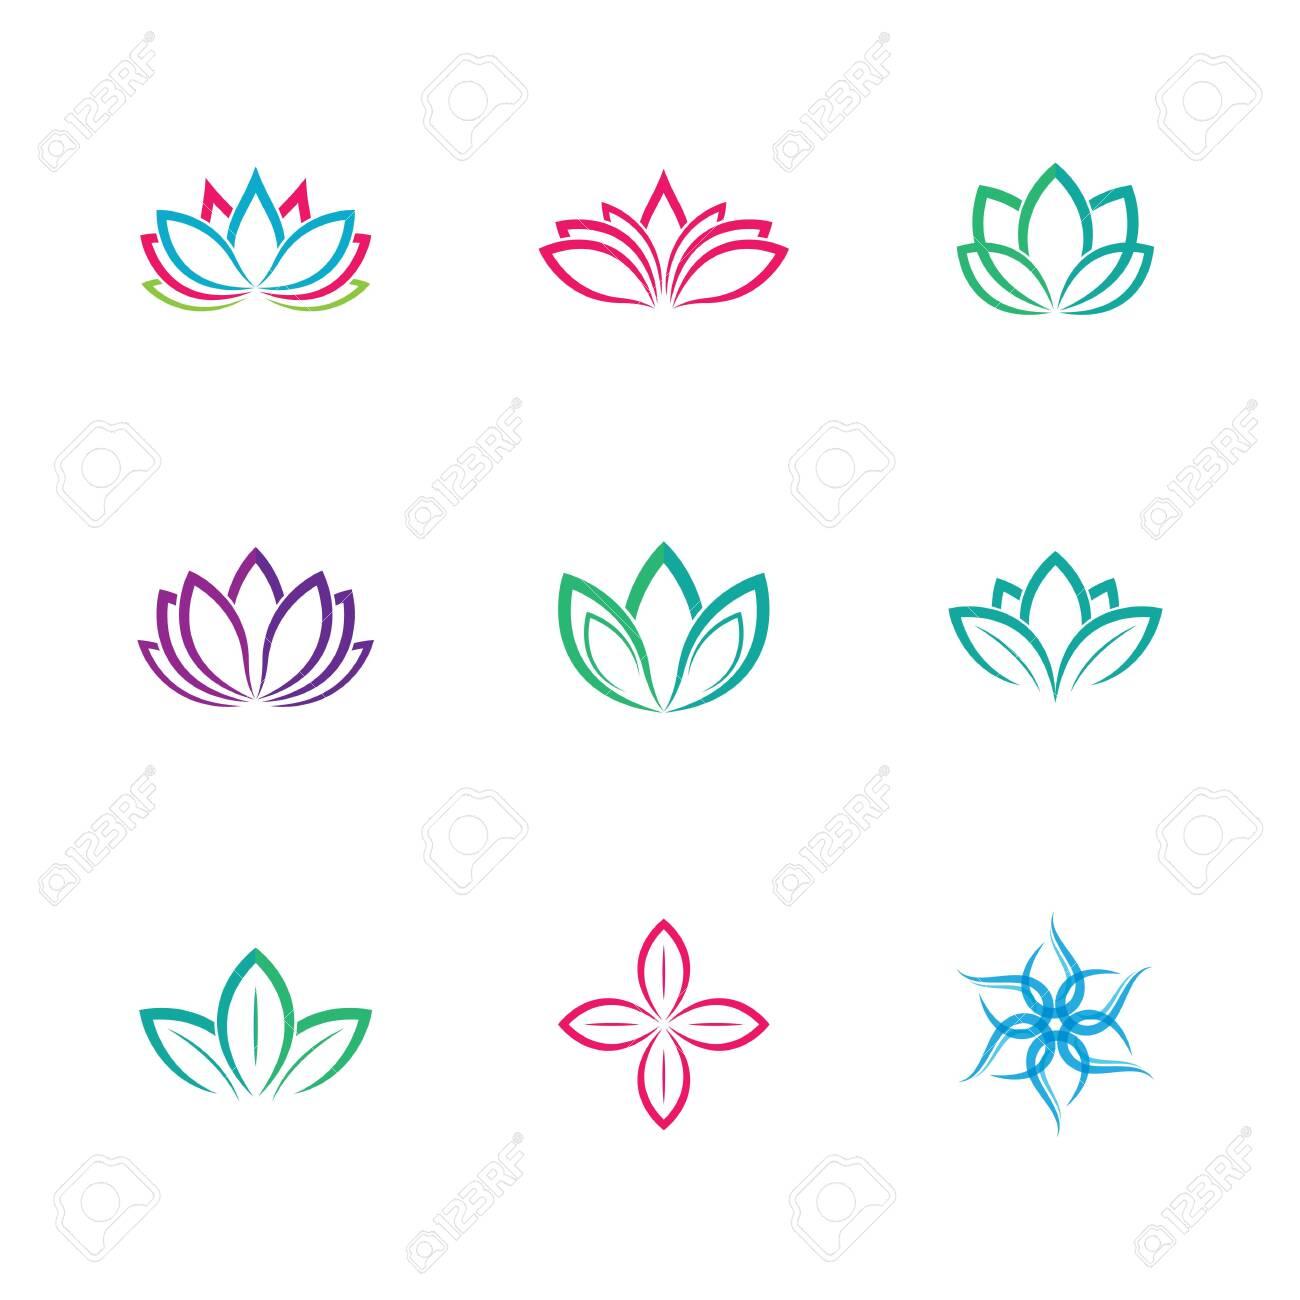 Lotus symbol vector icon illustration - 150062977